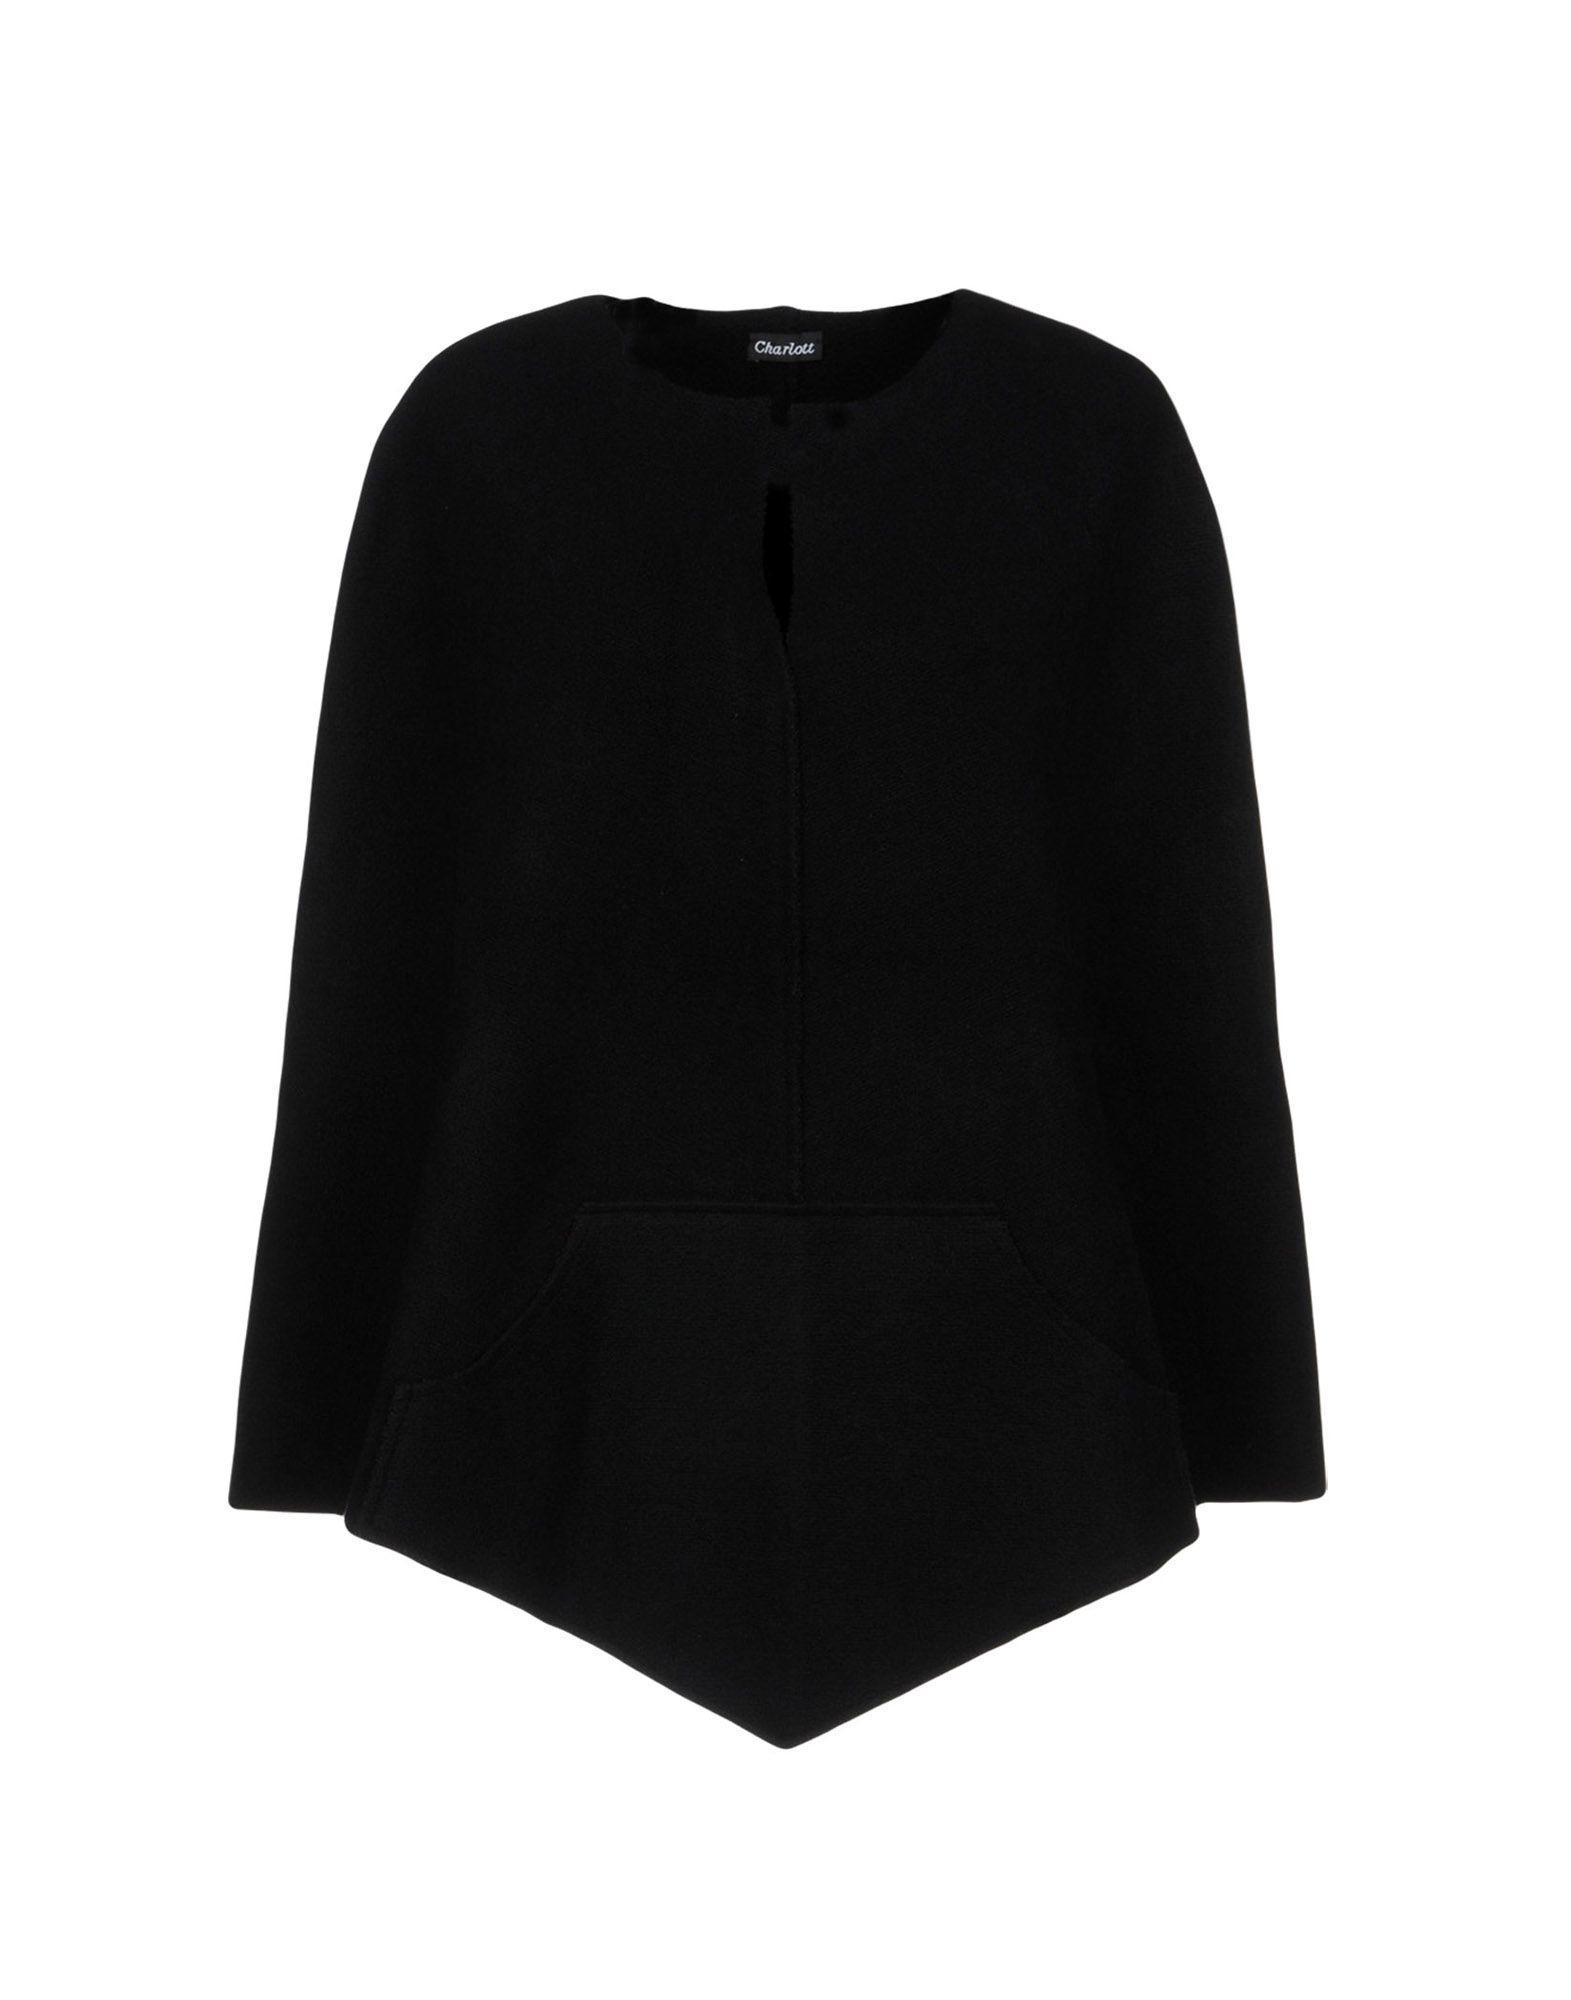 Charlott Cape In Black